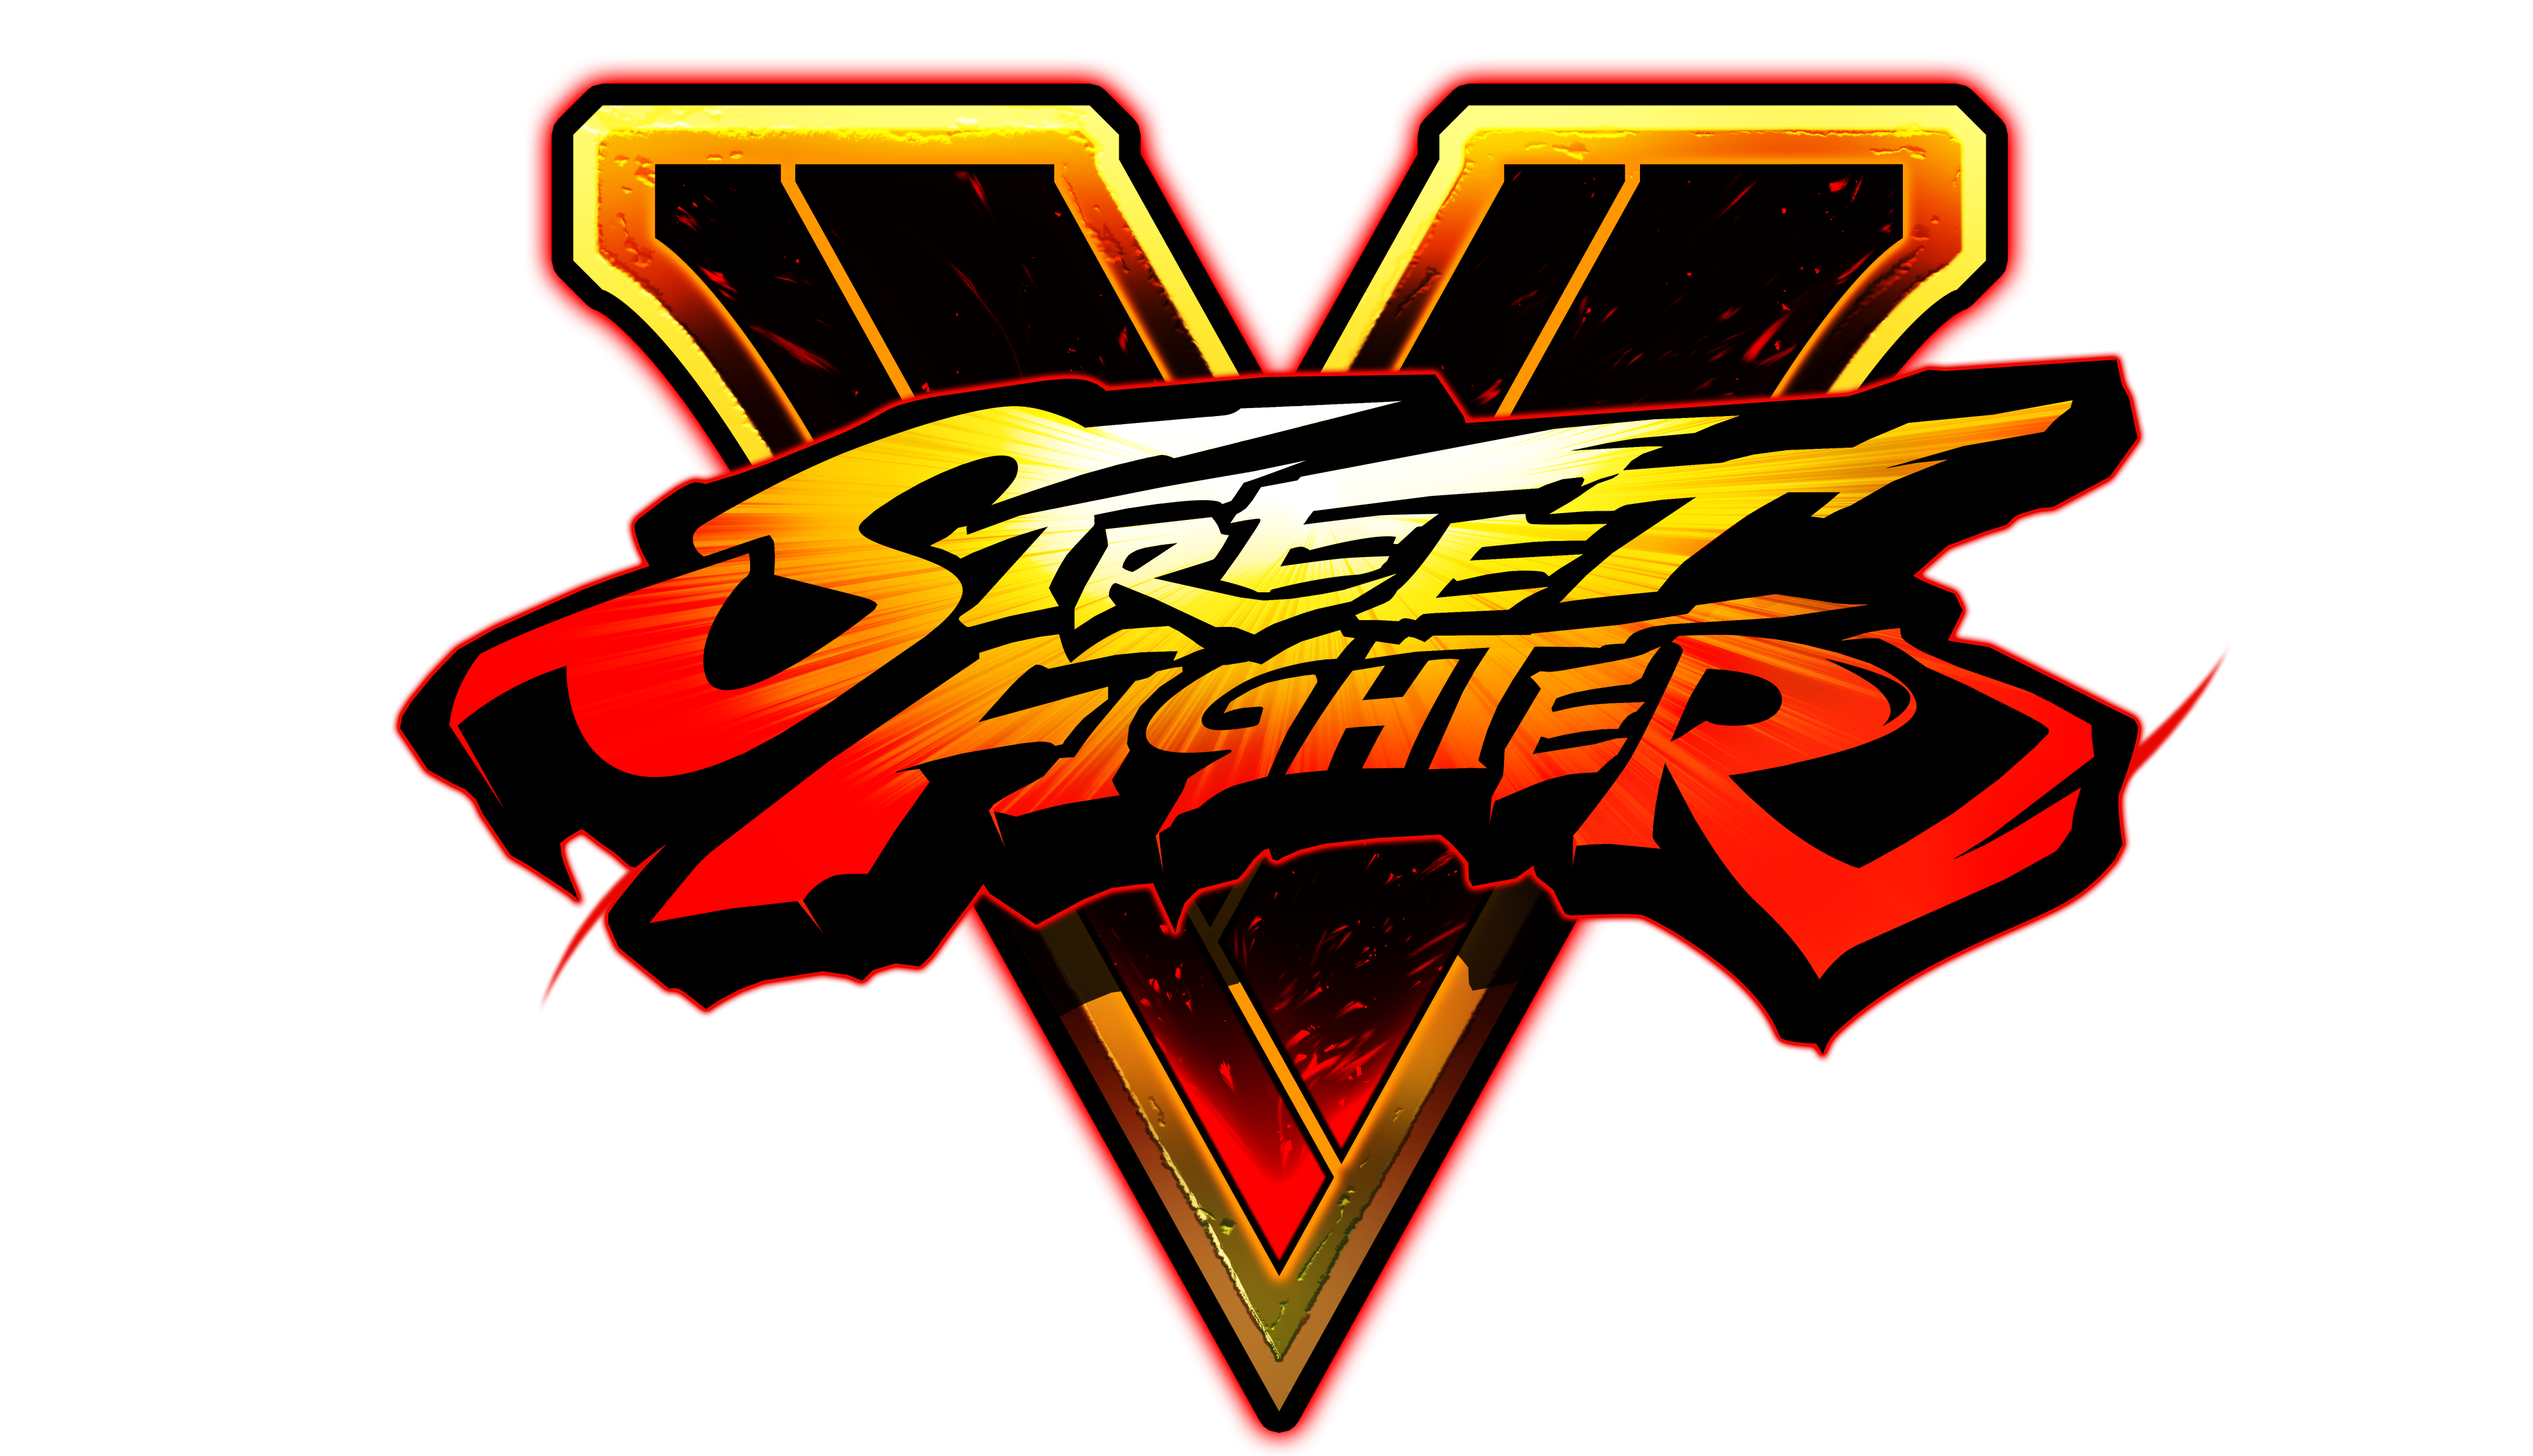 Street fighter 2014 trailer latino dating 5